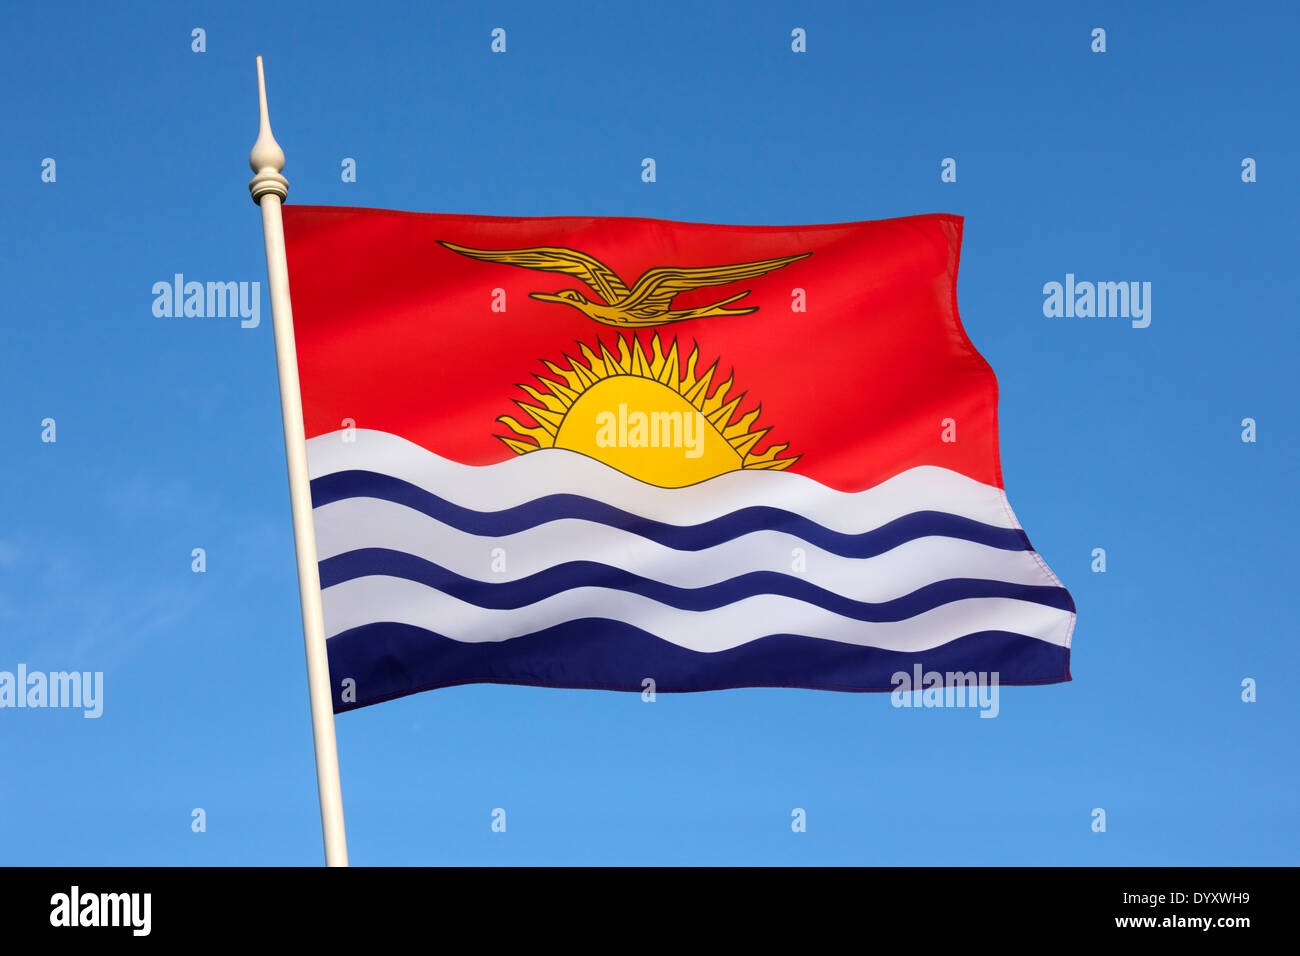 The national flag of Kiribati Stock Photo